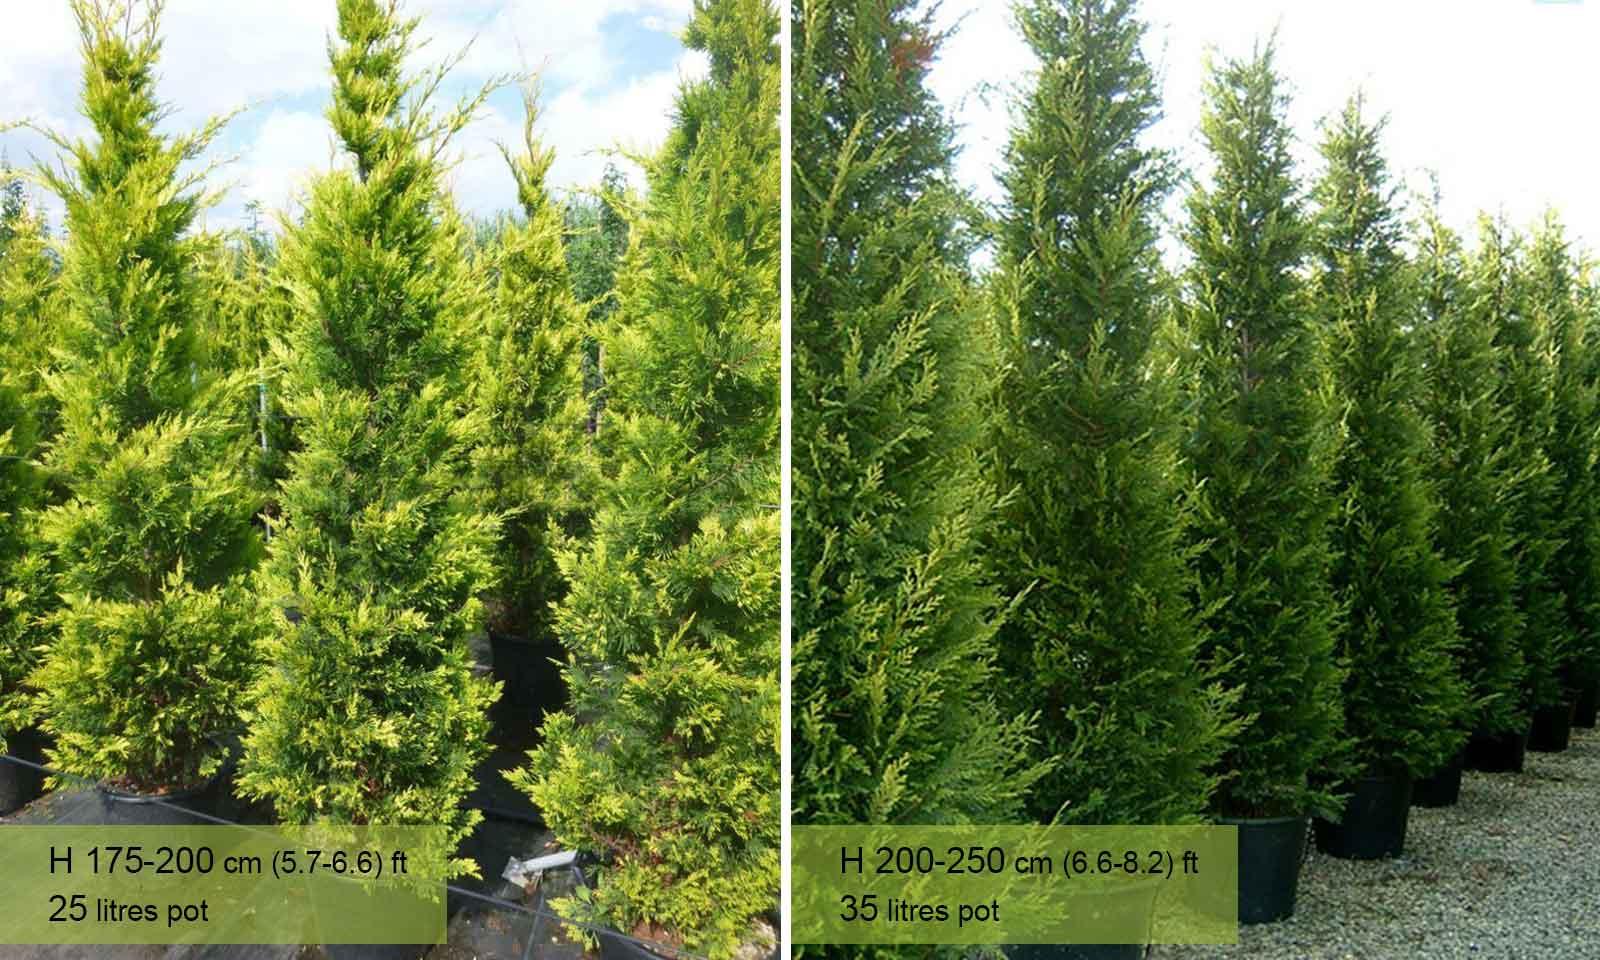 Cupressocyparis Leylandii Castlewellan Gold (Castlewellan Gold Cypress, Leyland Cypress, Galway Gold) - Garden Plants Online